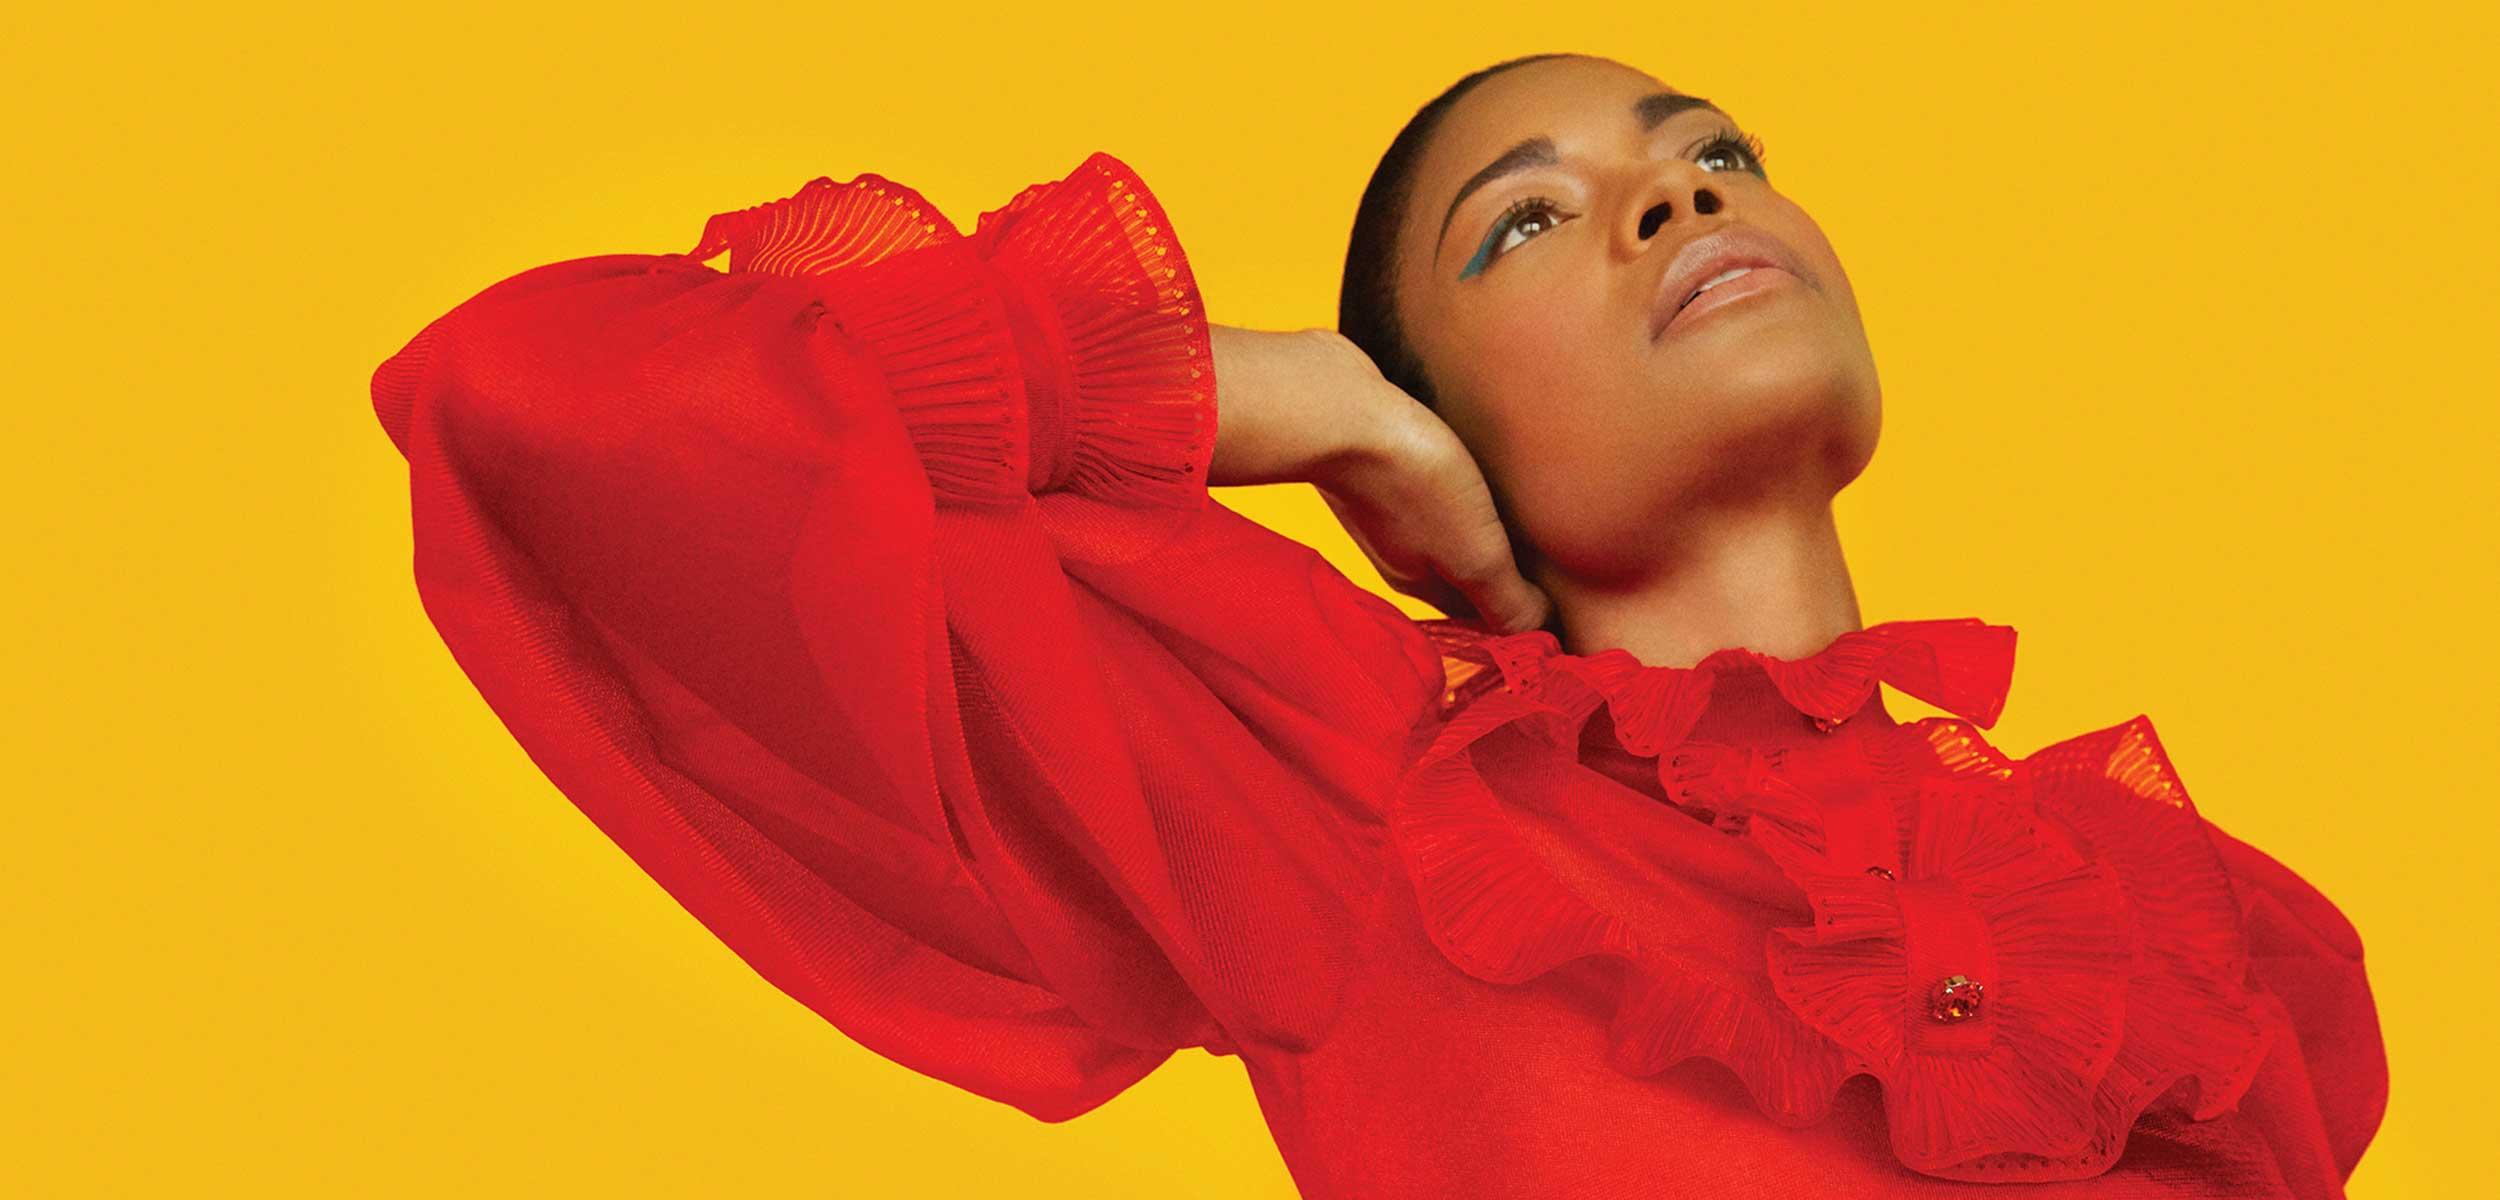 Naomie Harris in a red dress